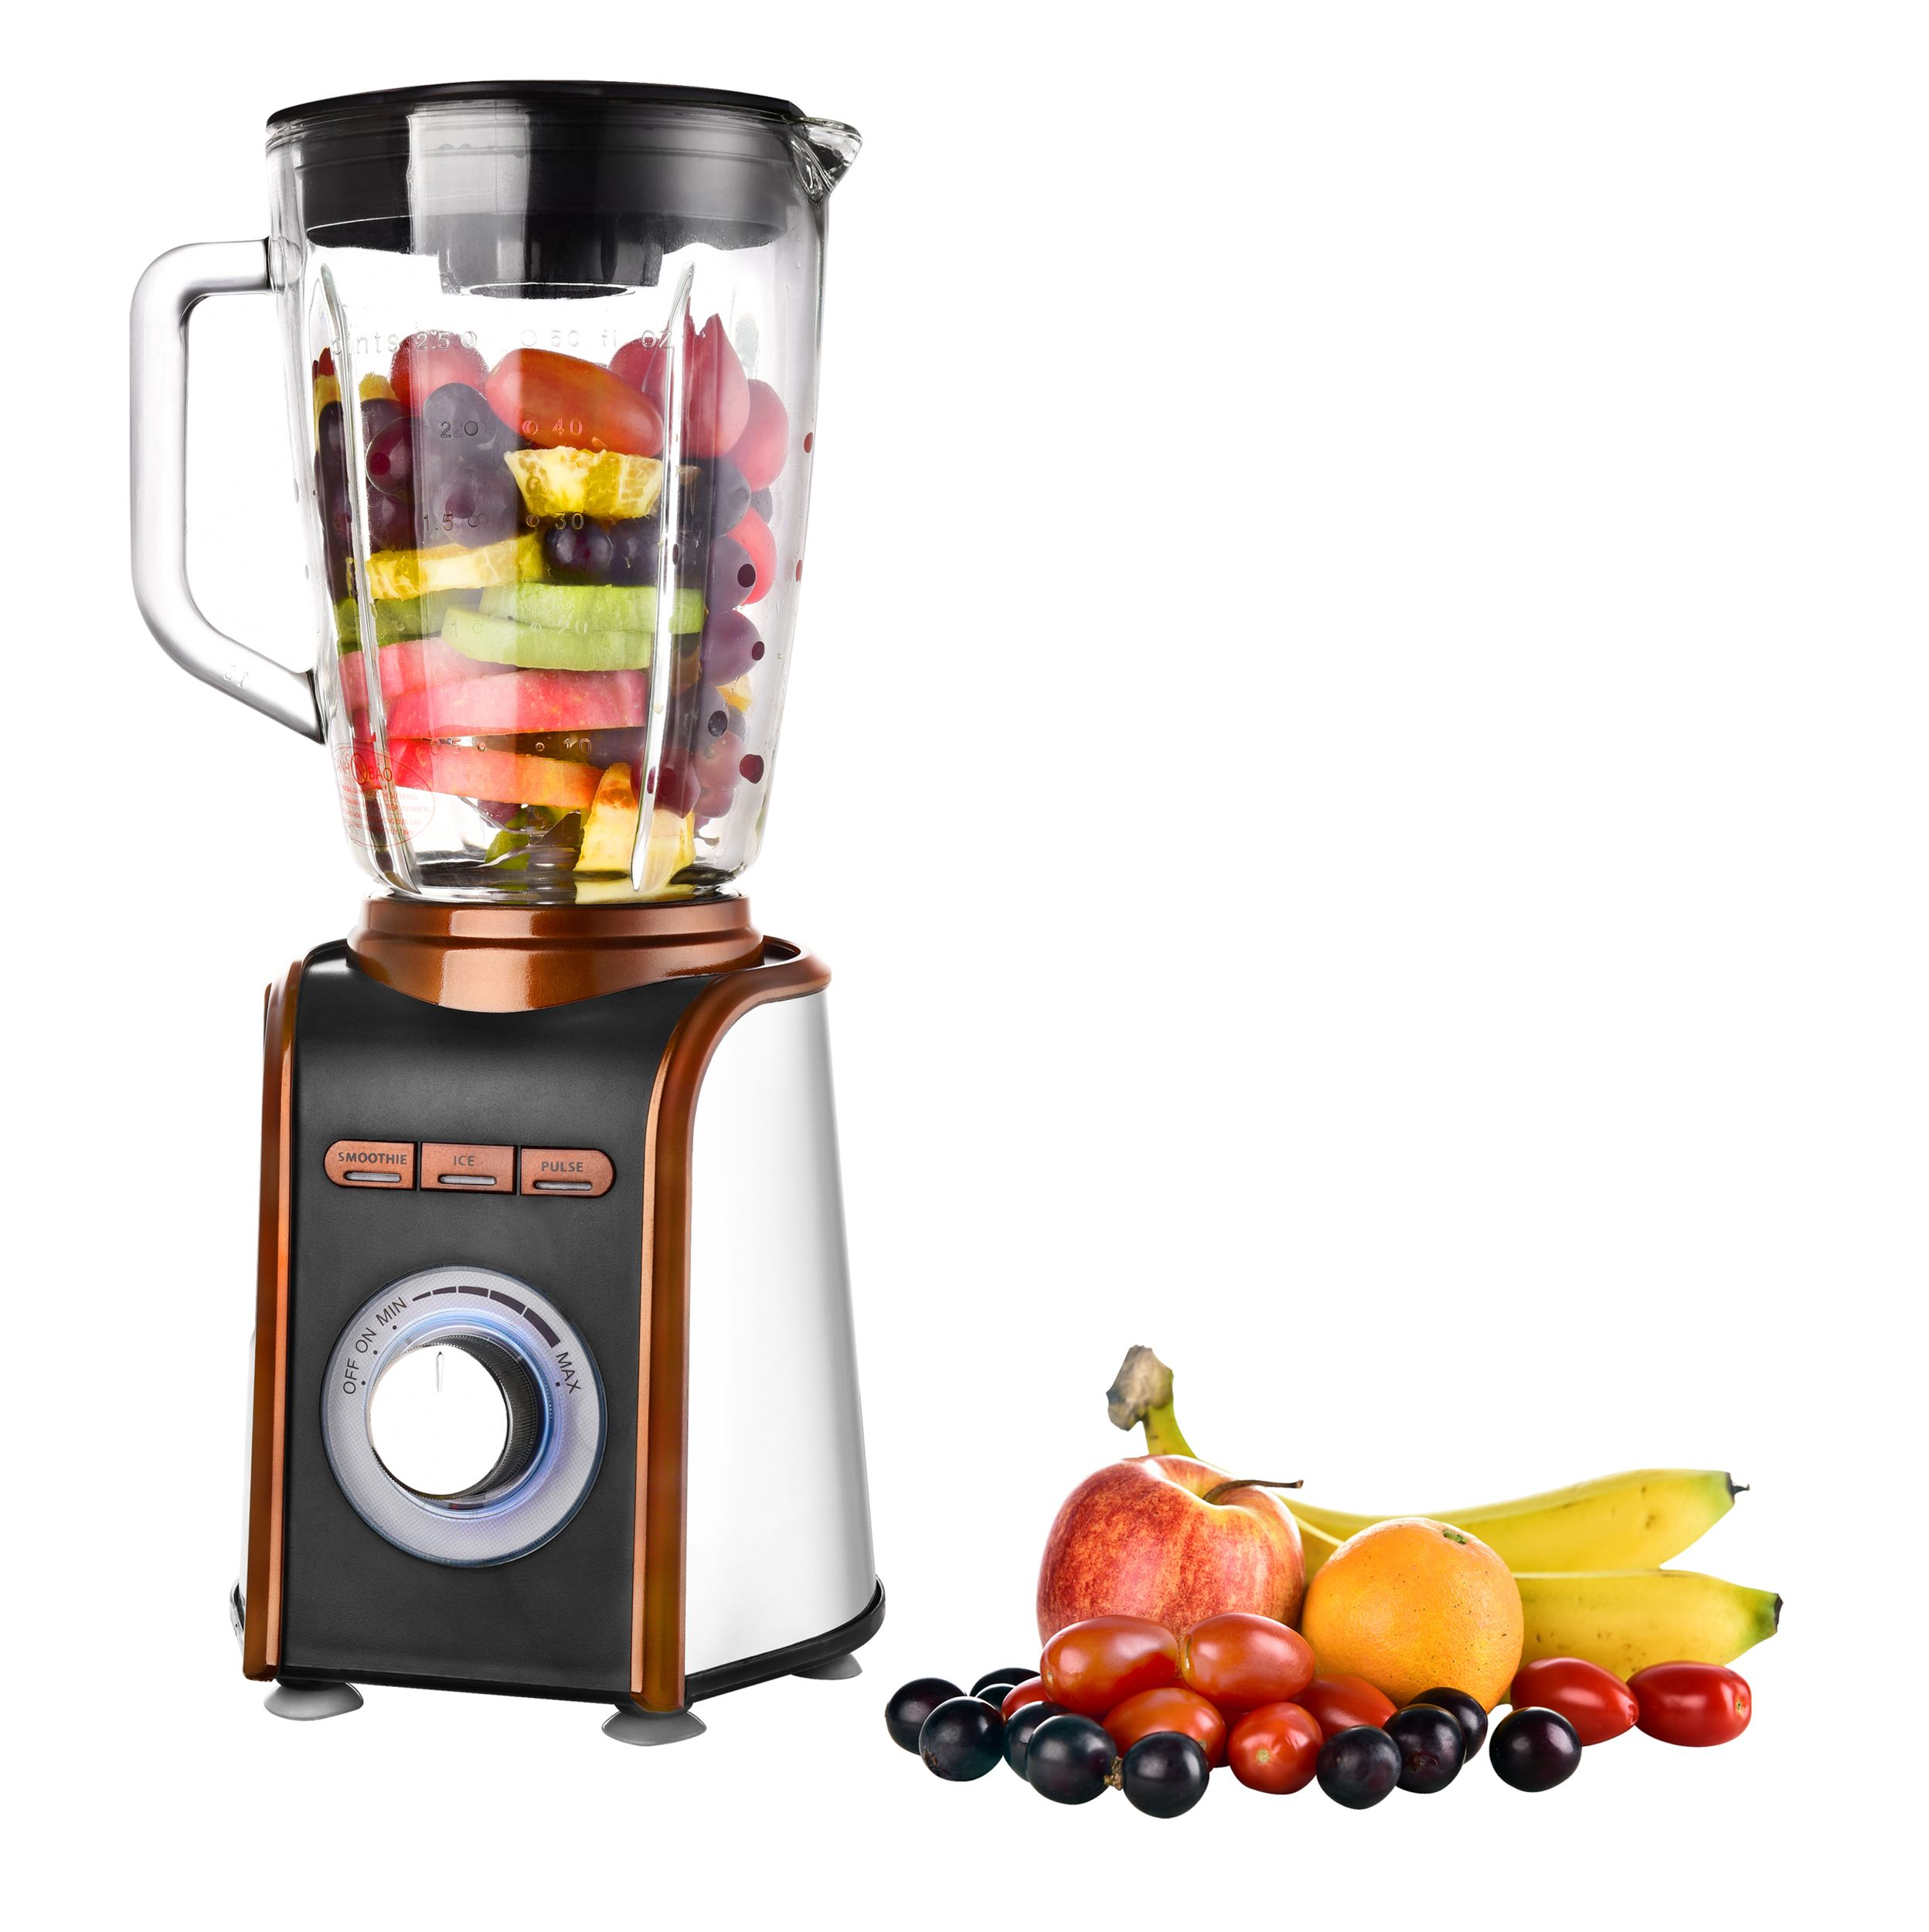 Standmixer Blender Smoothiemaker Cocktailmixer Glaskrug Eis Crusher 1,5 Liter 700 W NEU*94227 Bild 4